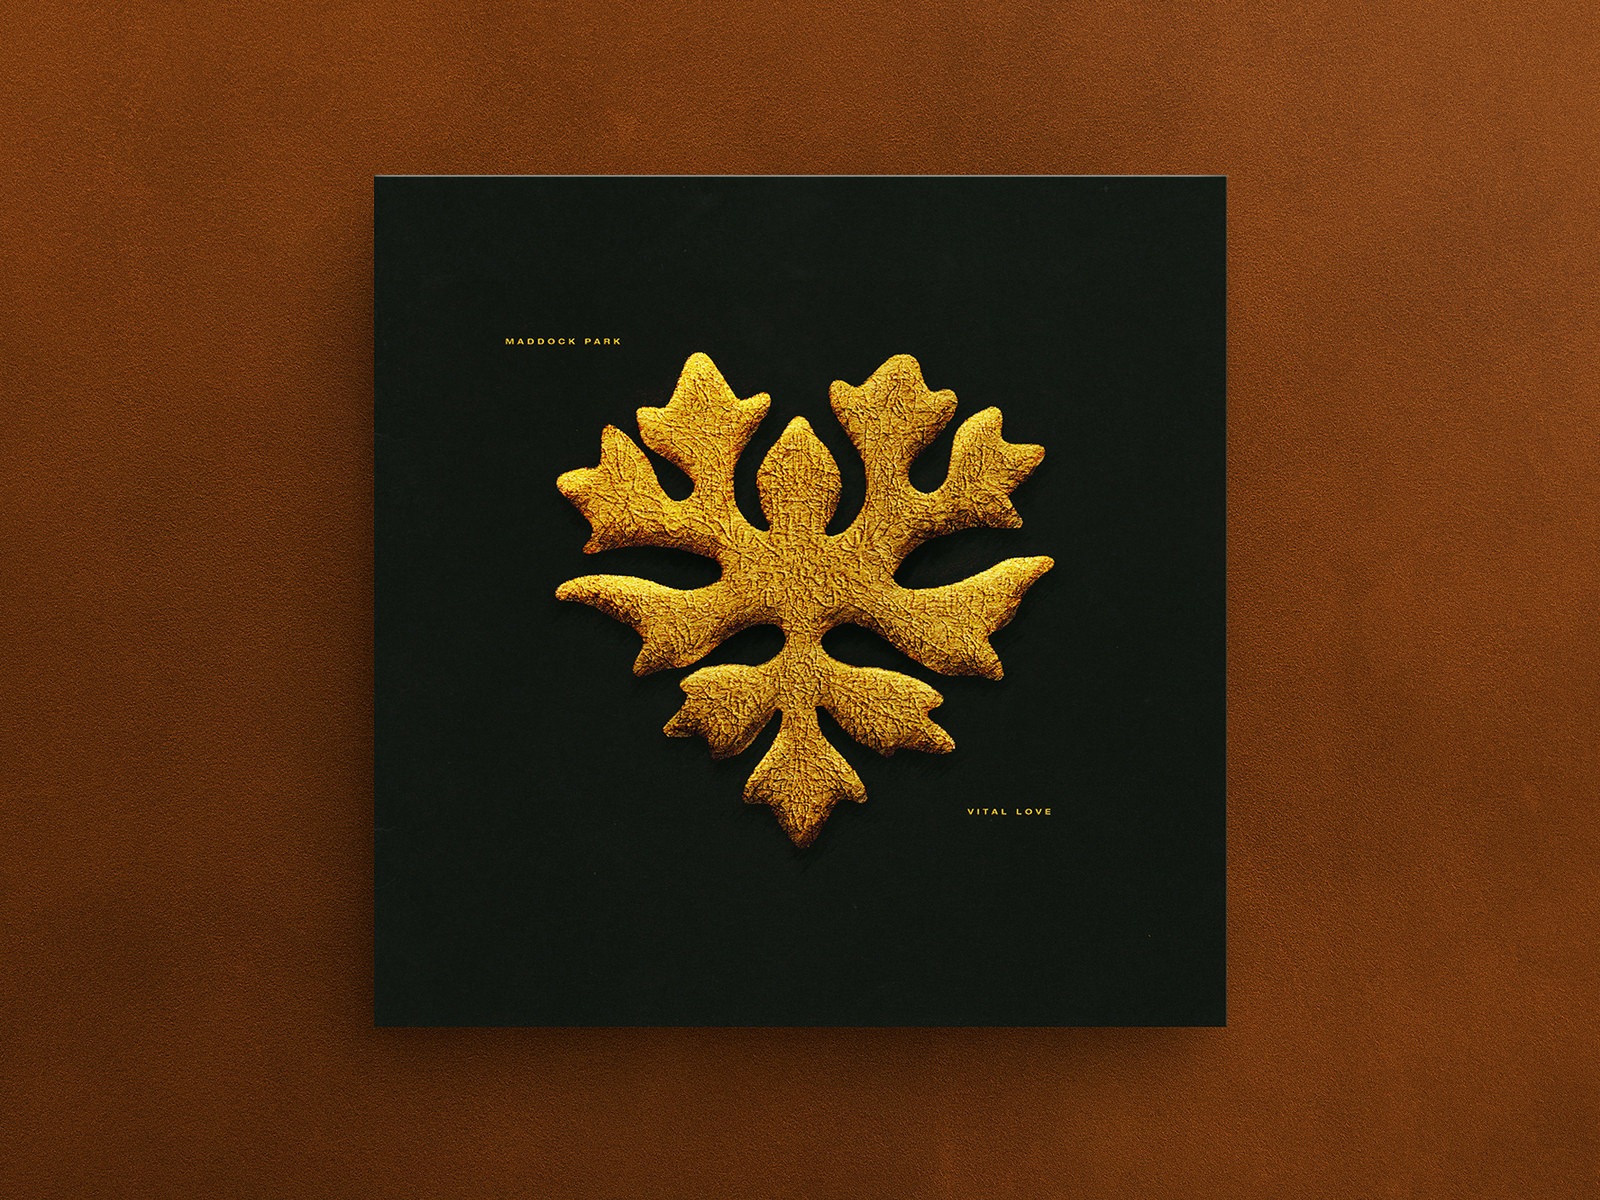 Vital Love Album Cover Draft 2